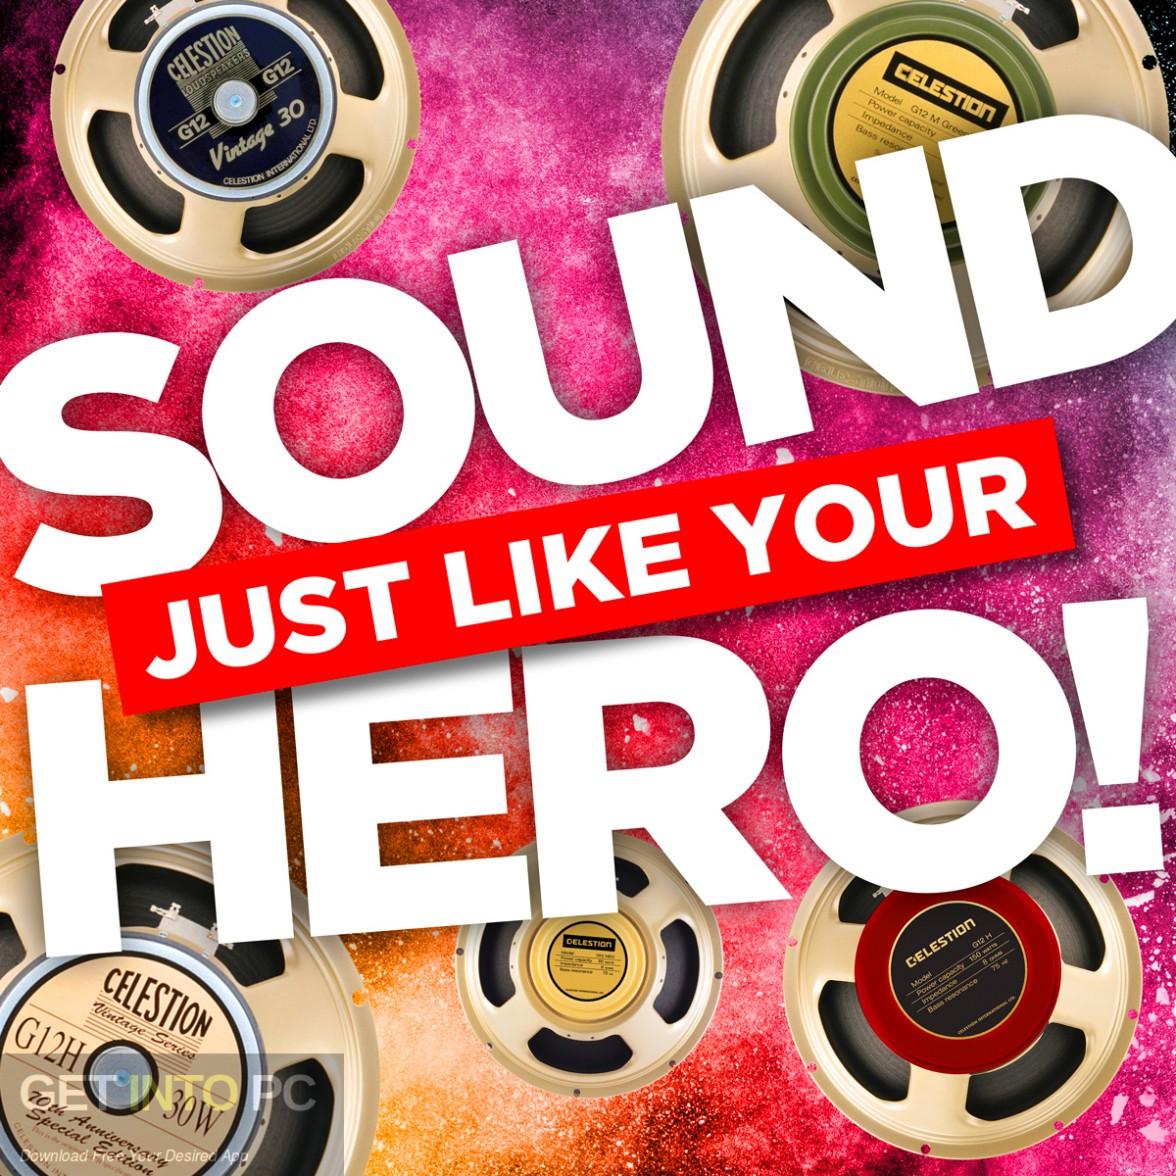 Celestion Impulse Responses - Vintage 30 Sound Library Latest Version Download-GetintoPC.com